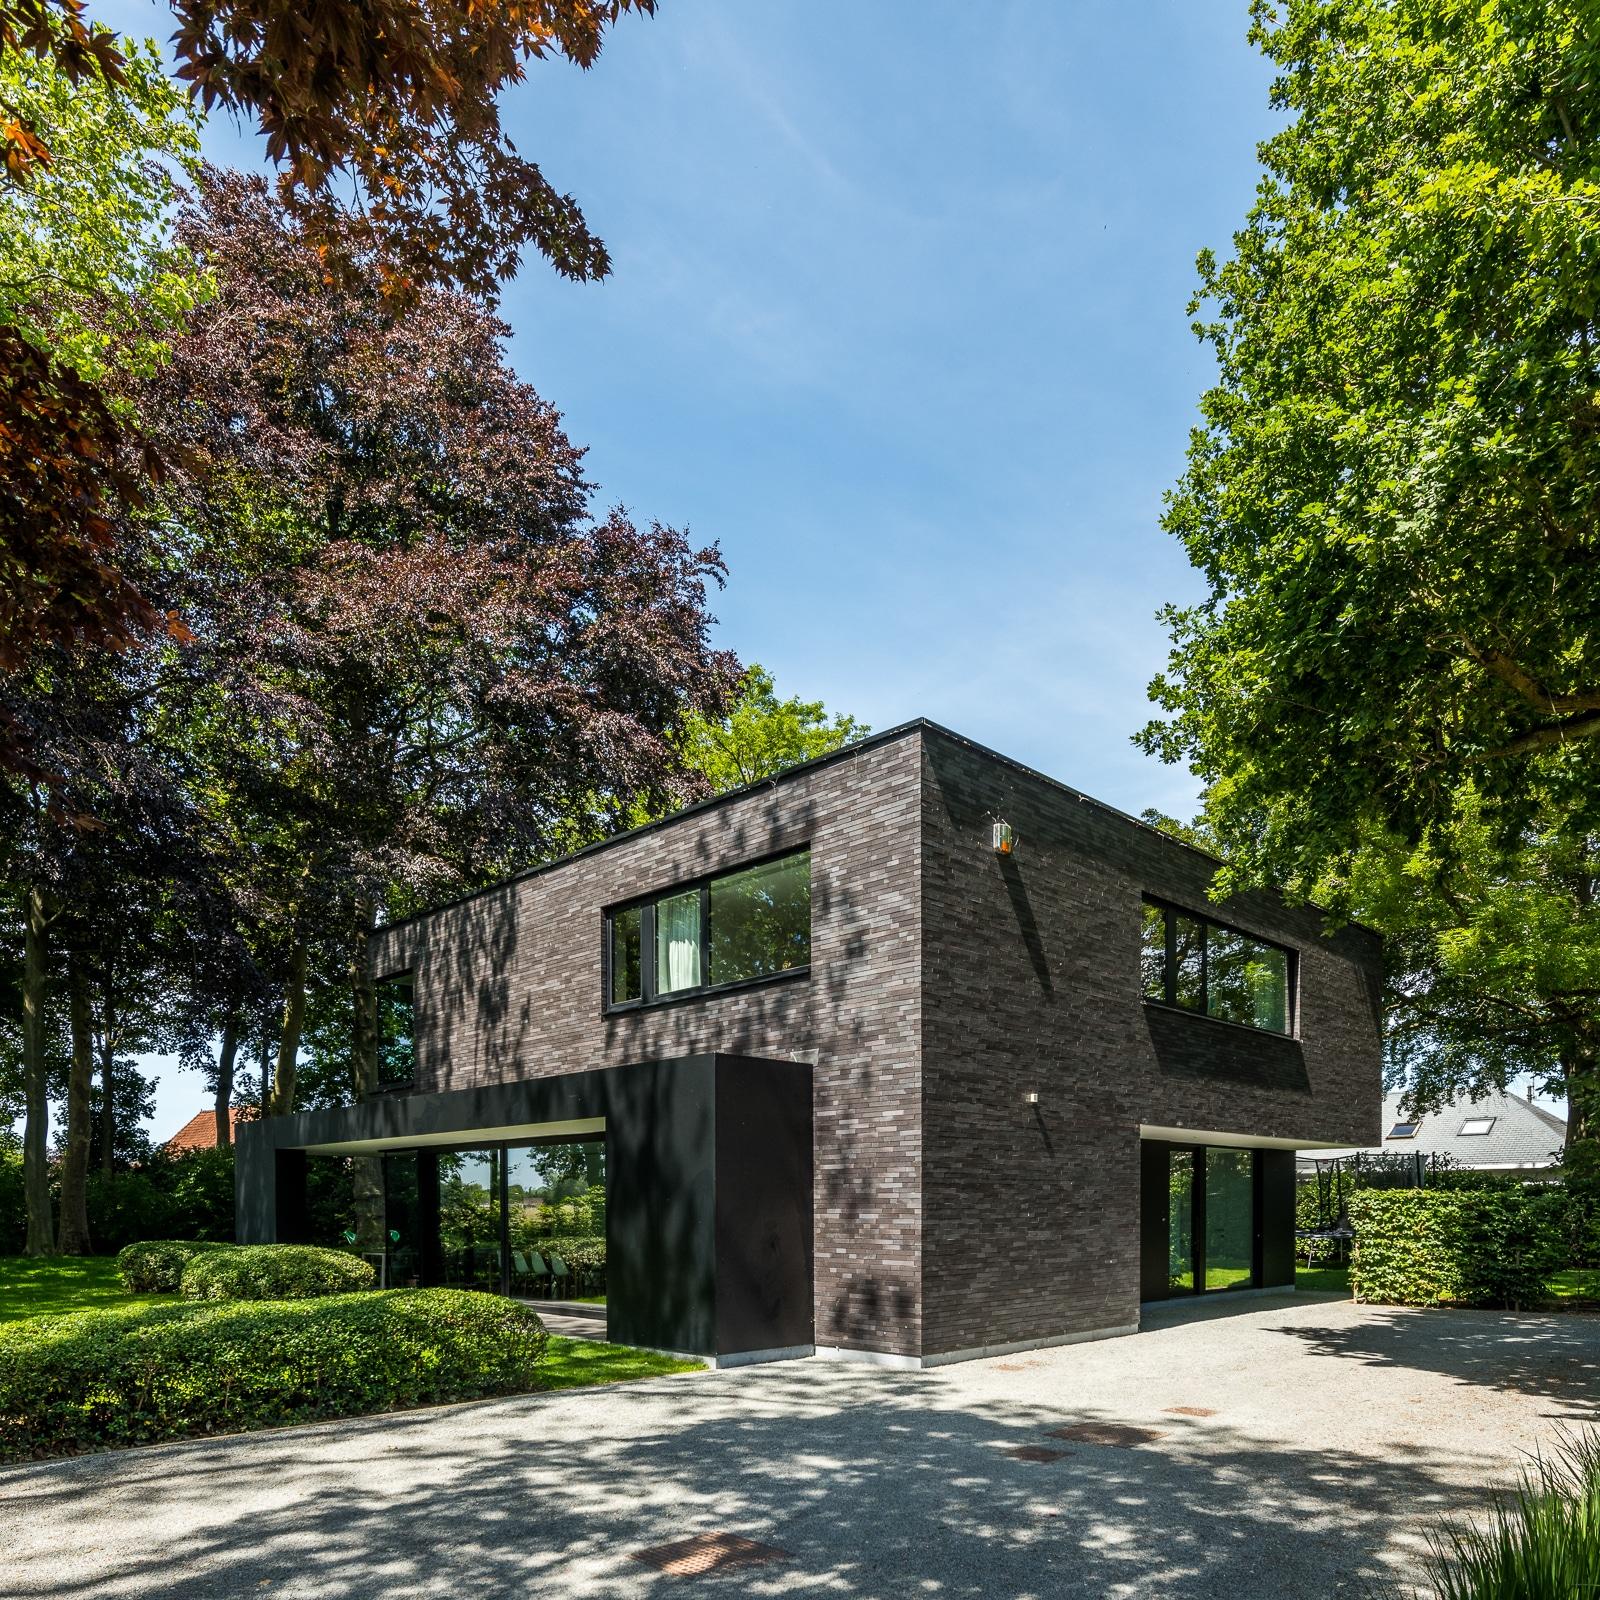 BaeyensBeck Kjell 001web | Baeyens & Beck architecten Gent | architect nieuwbouw renovatie interieur | high end | architectenbureau